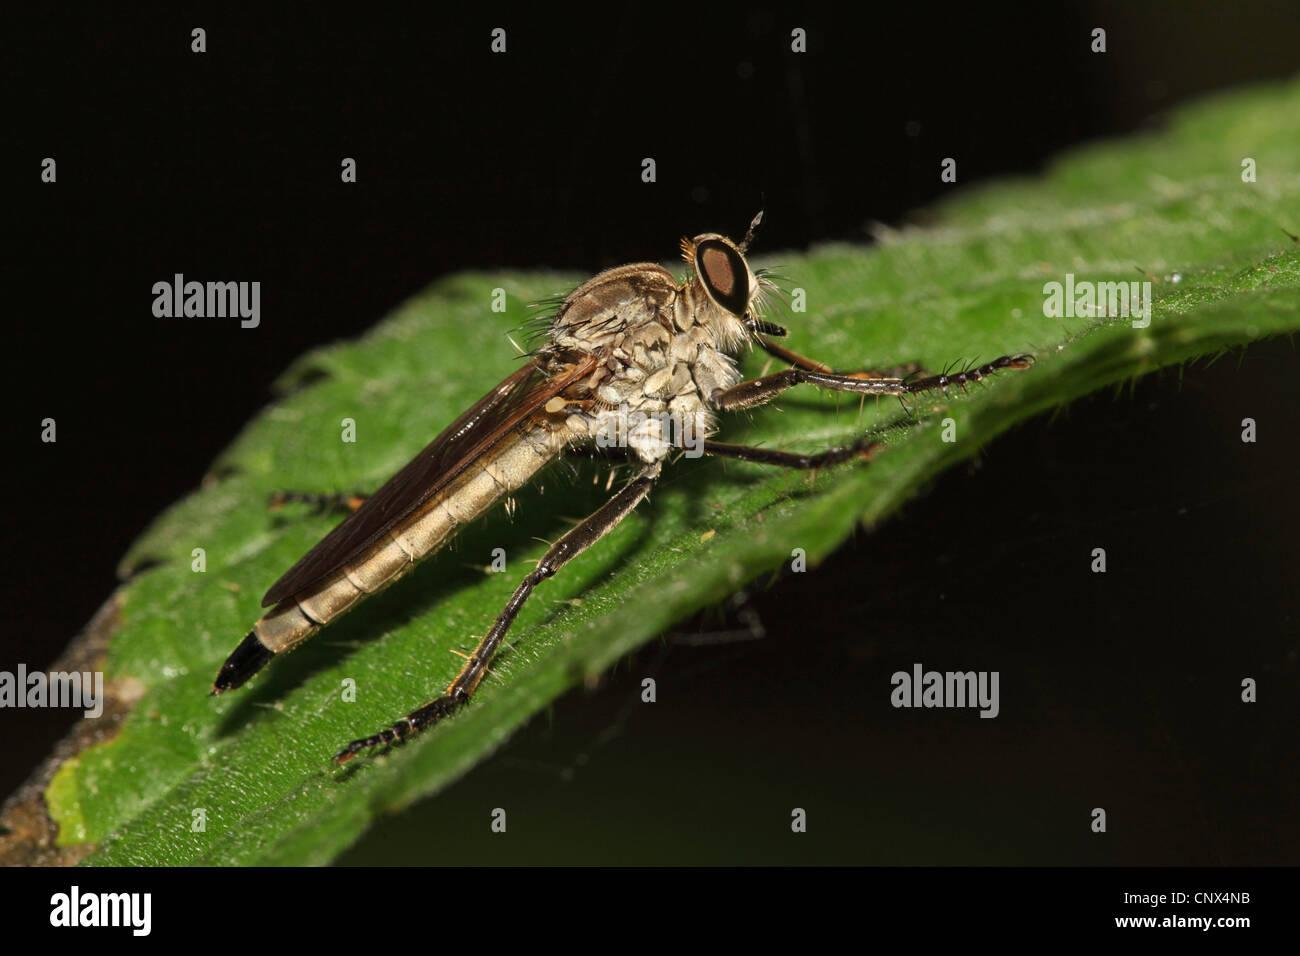 common awl robberfly (Neoitamus cyanurus), sitting on stinging nettle, Greece, Kerkini-See - Stock Image